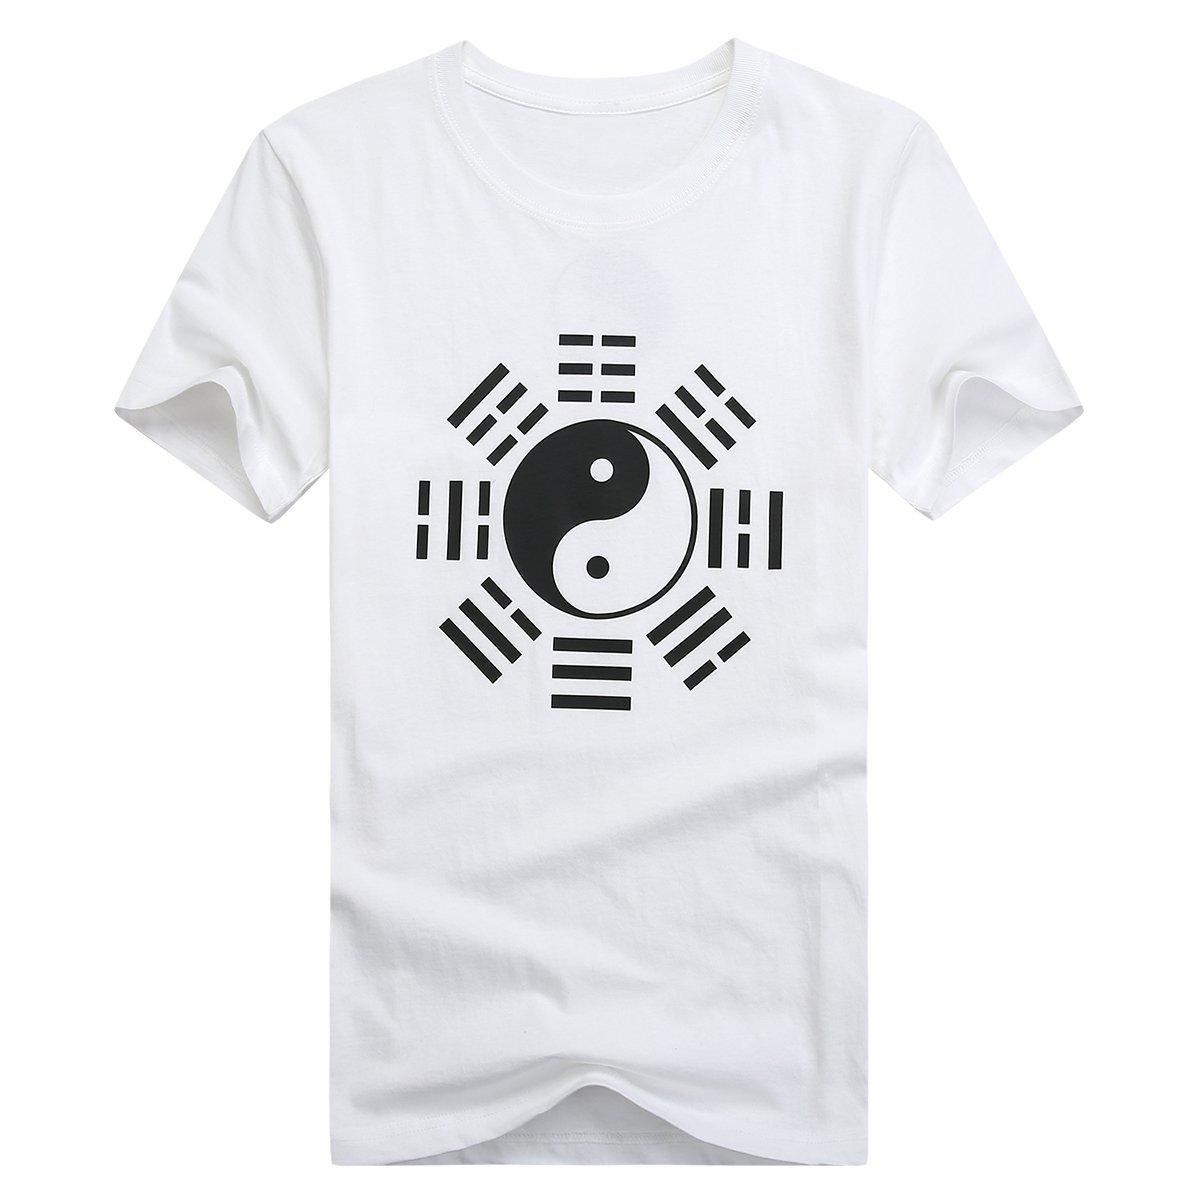 icnbuys Damen Tai Chi T-Shirt Acht Trigramme grau WMTCTET001